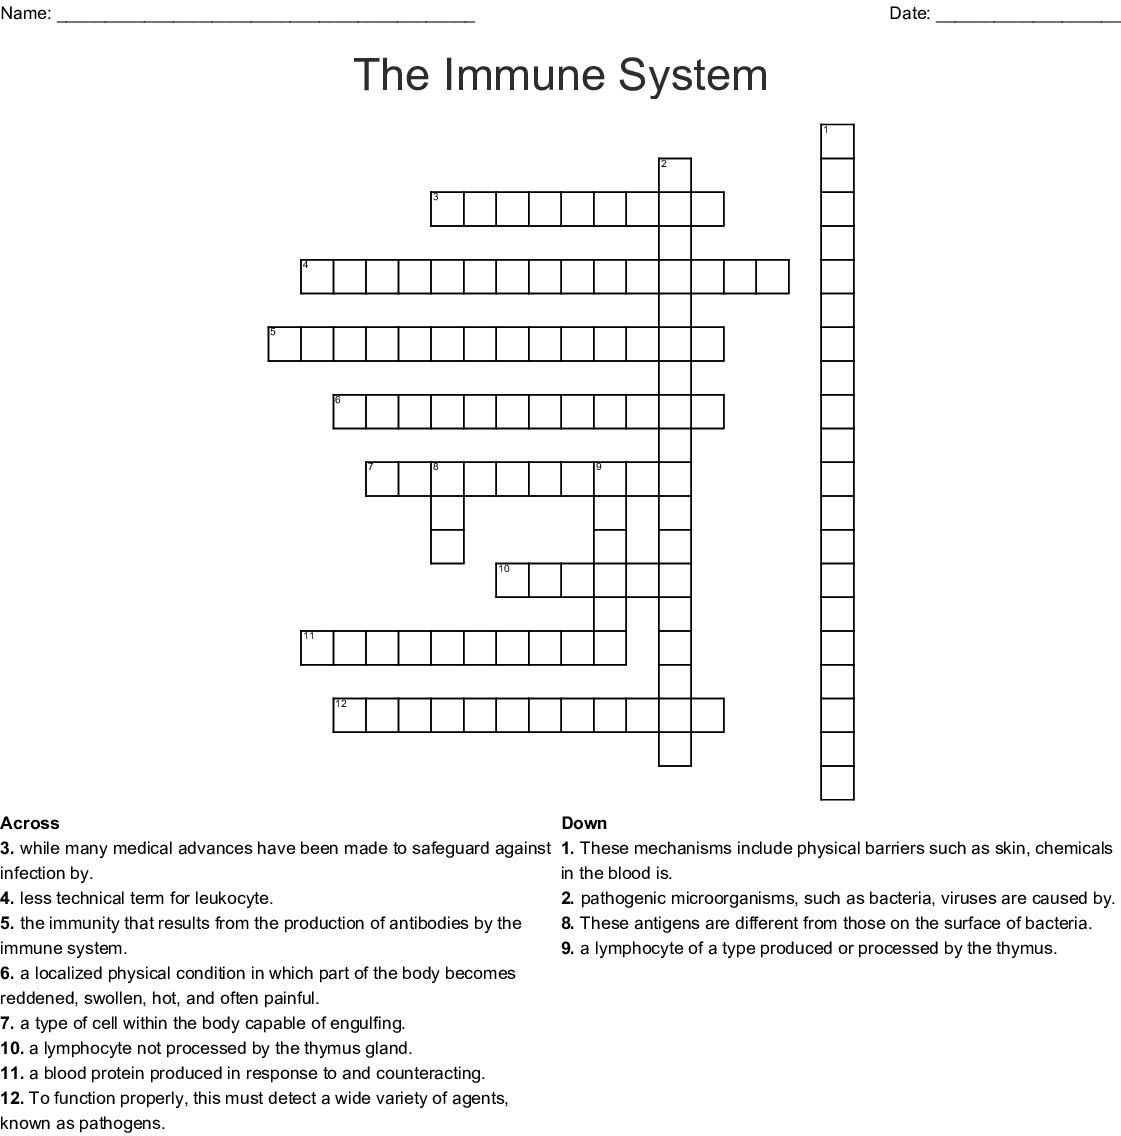 Immune System Worksheet Answer Key